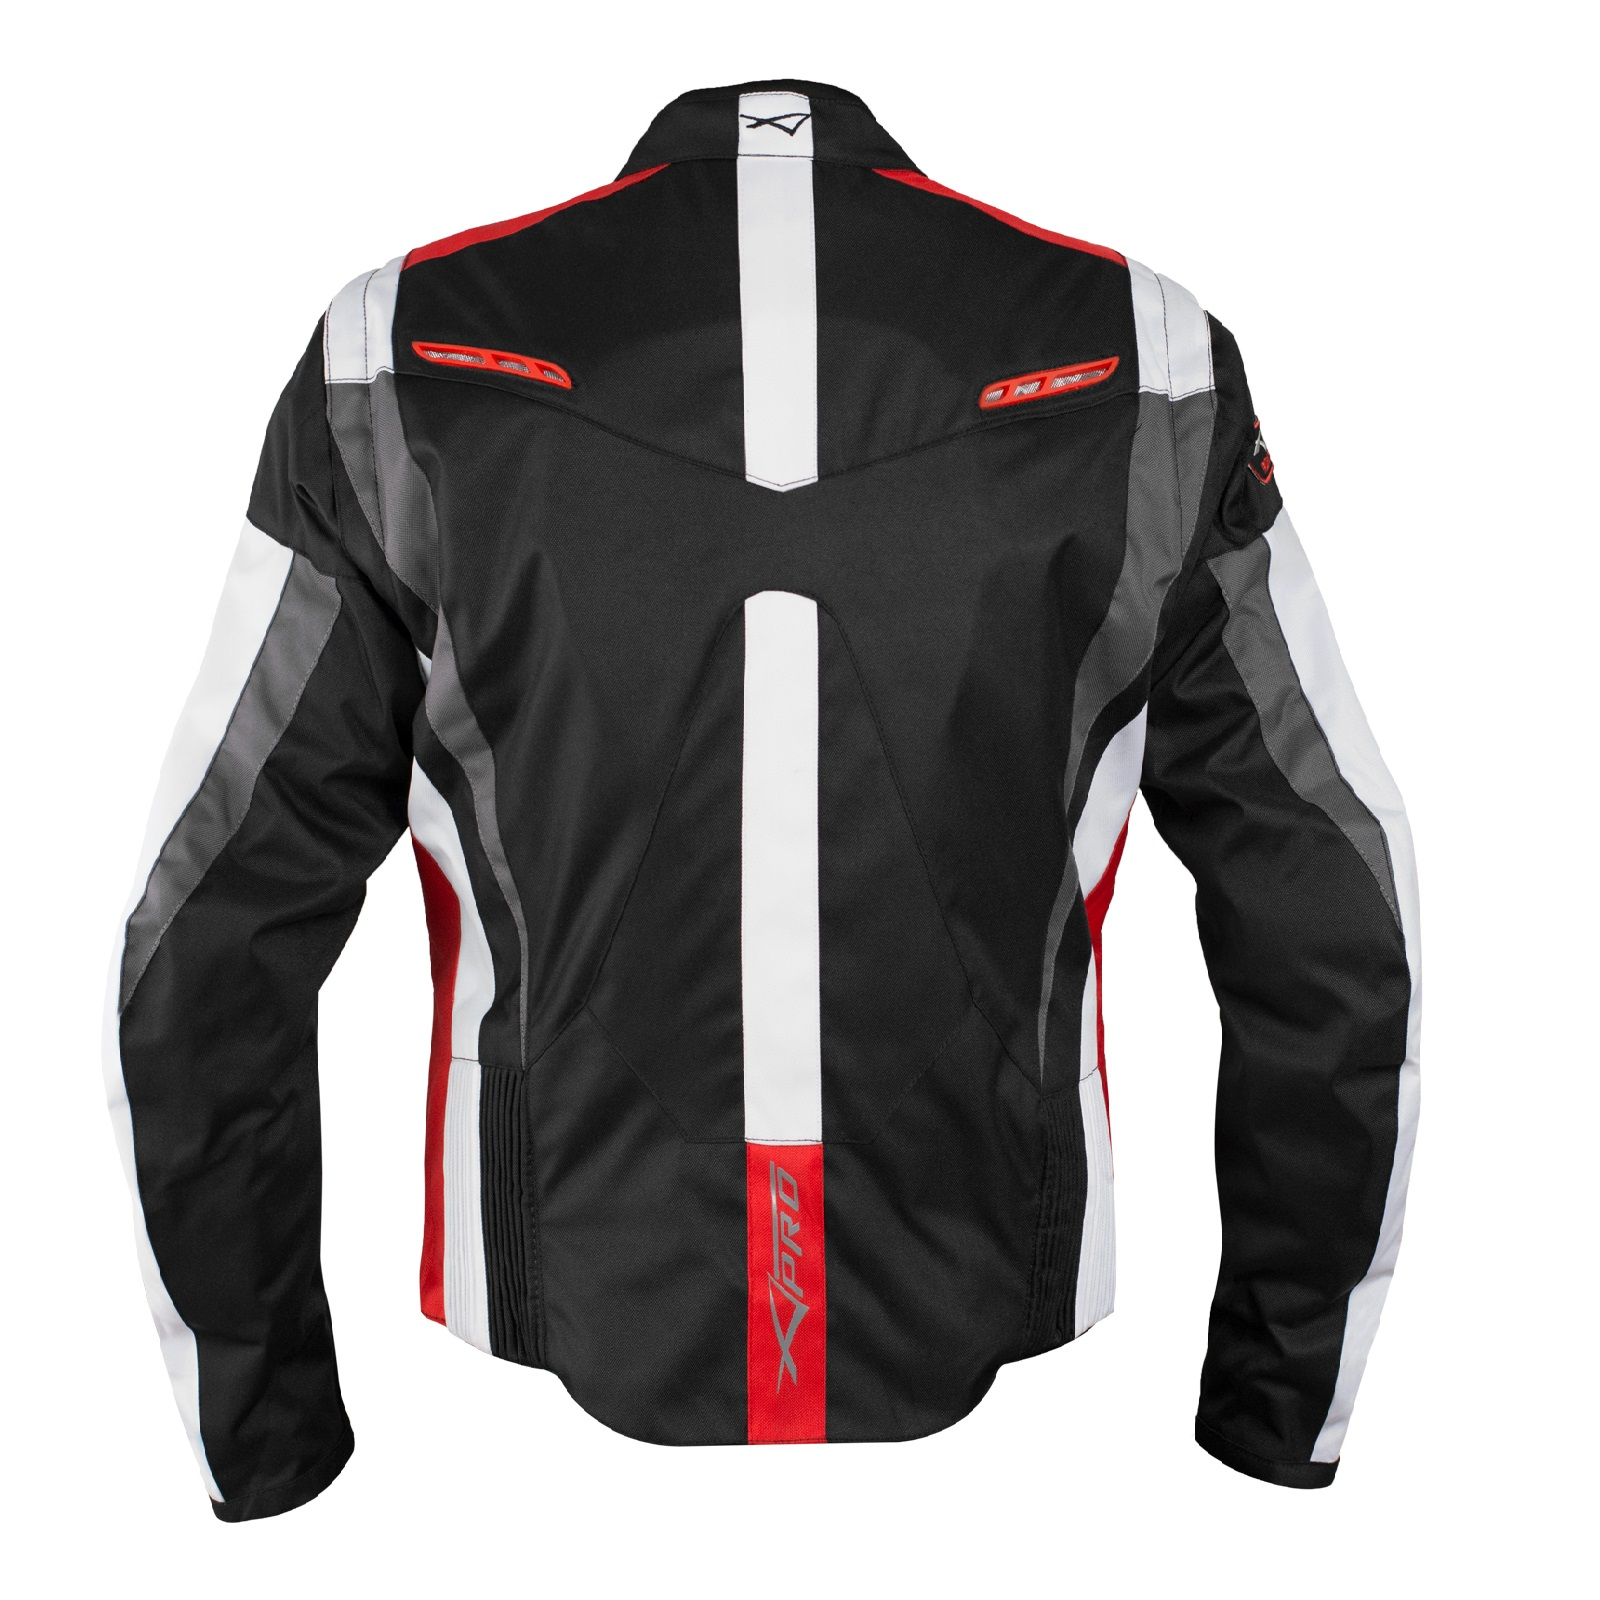 gazechimp Manubrio Moto Bici Orologio Supporto Per Garmin Forerunner 310xt 405 405CX